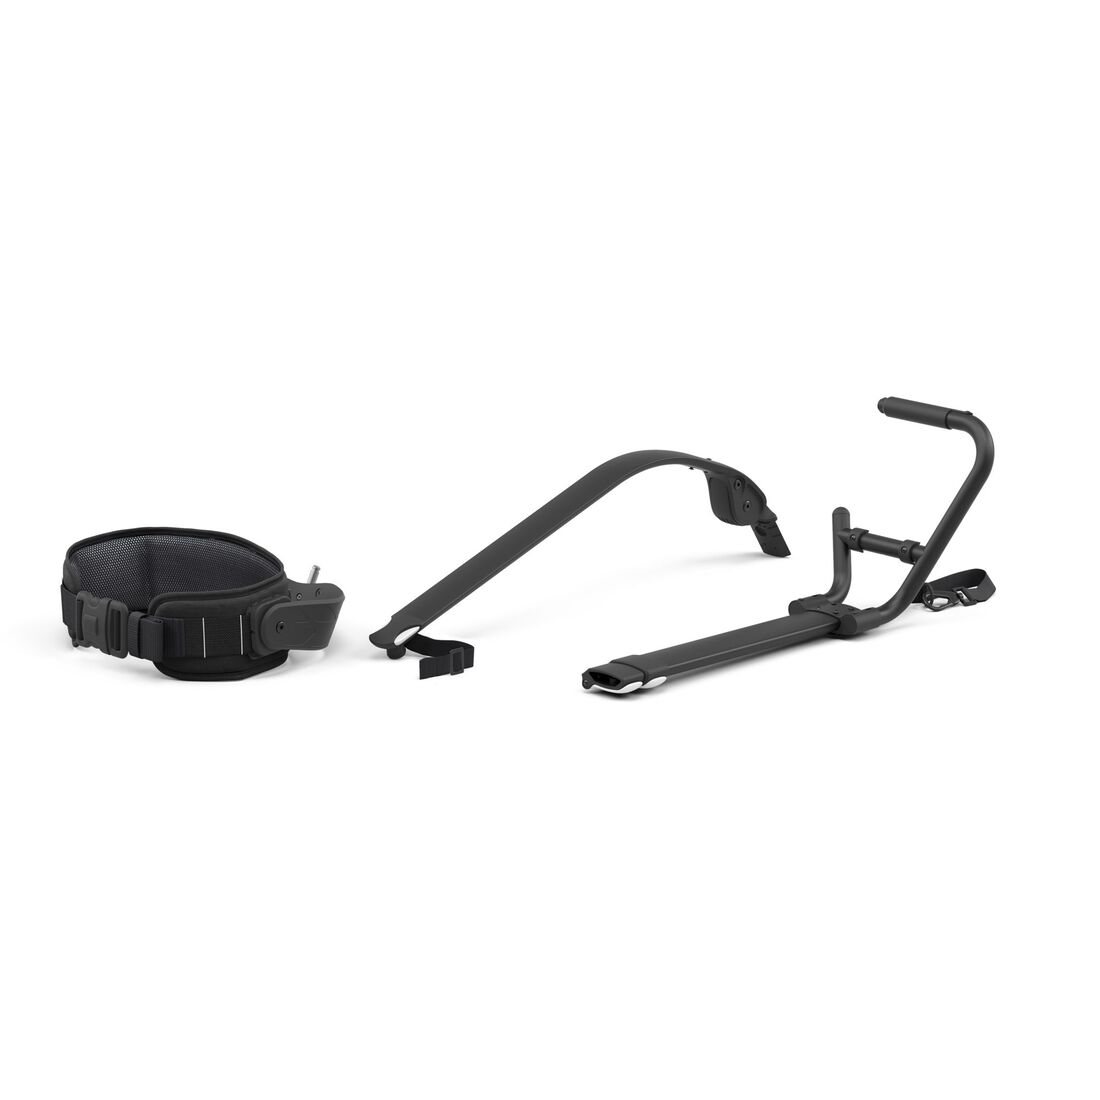 CYBEX Zeno Hands-free Kit - Black in Black large image number 3